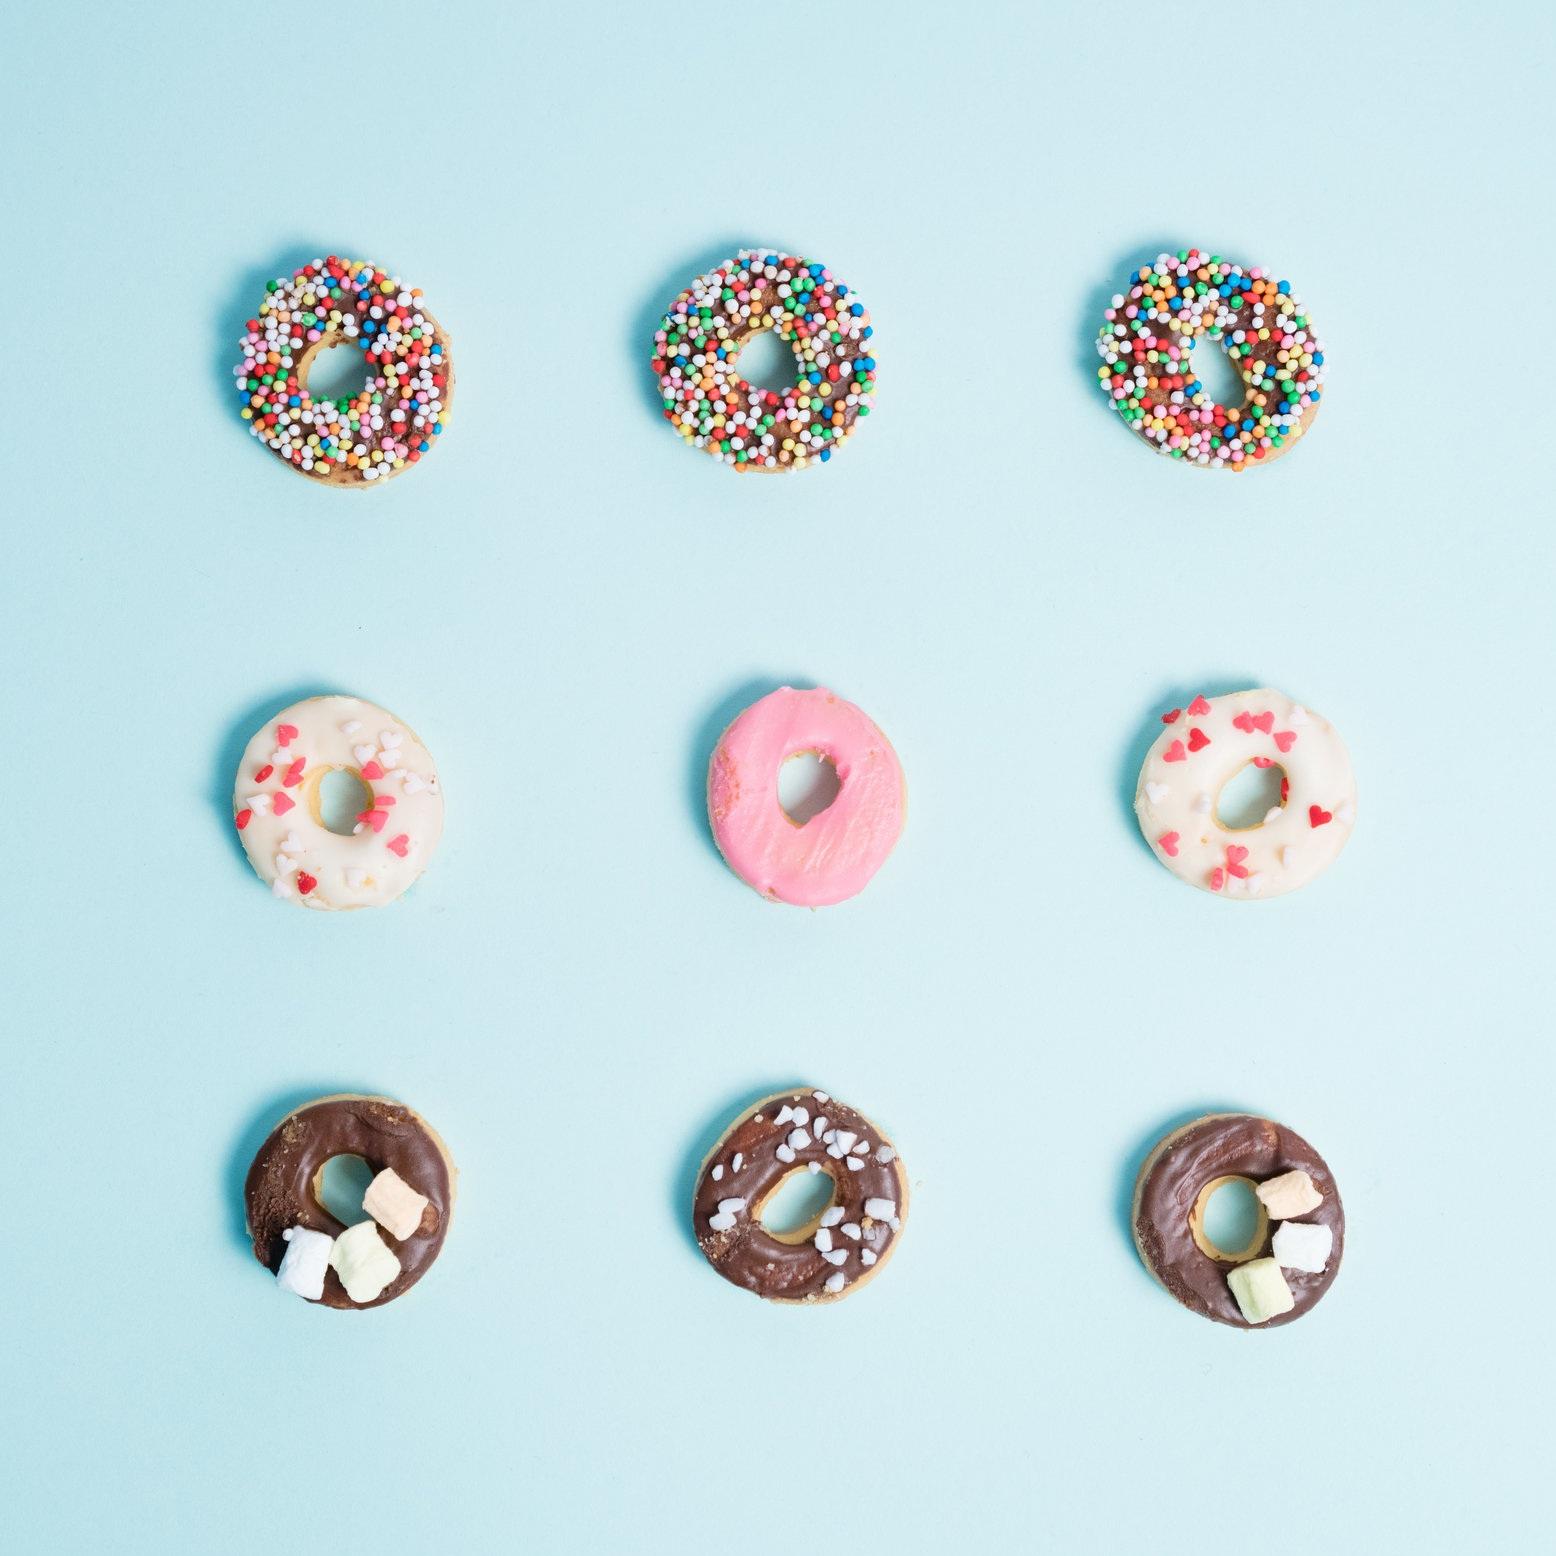 Donut-0415.jpg